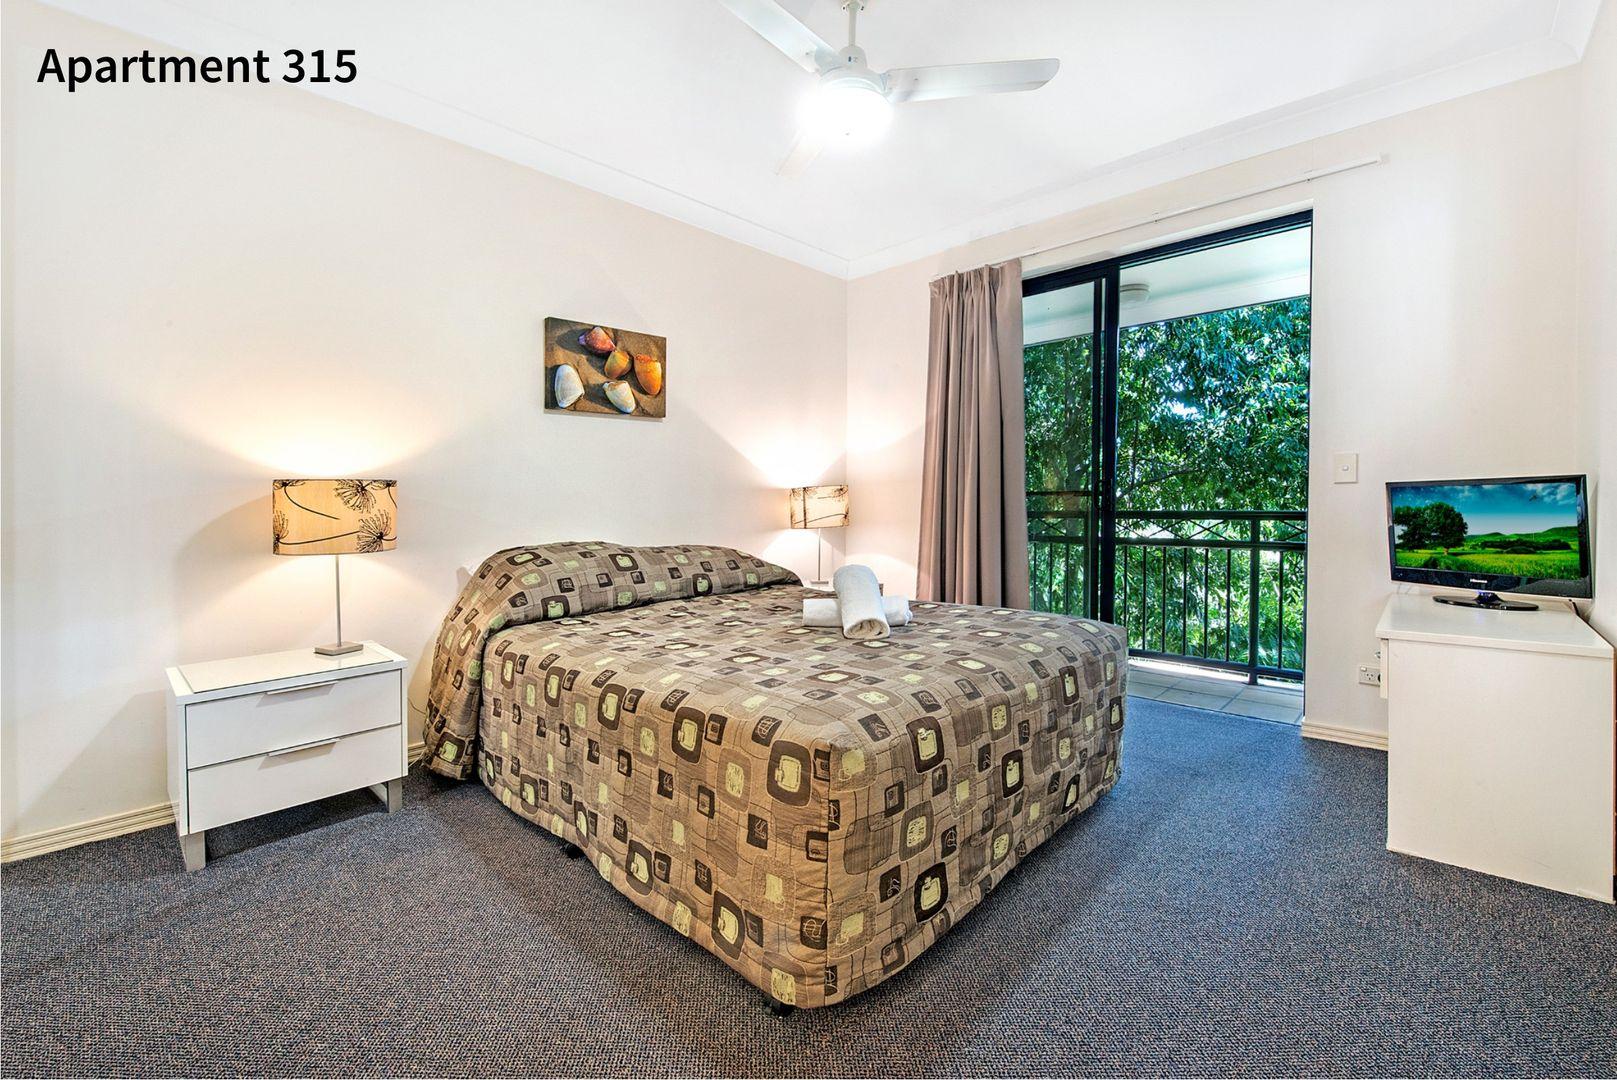 315 & 210/2342 'Turtle Beach Resort' Gold Coast Highway, Mermaid Beach QLD 4218, Image 1